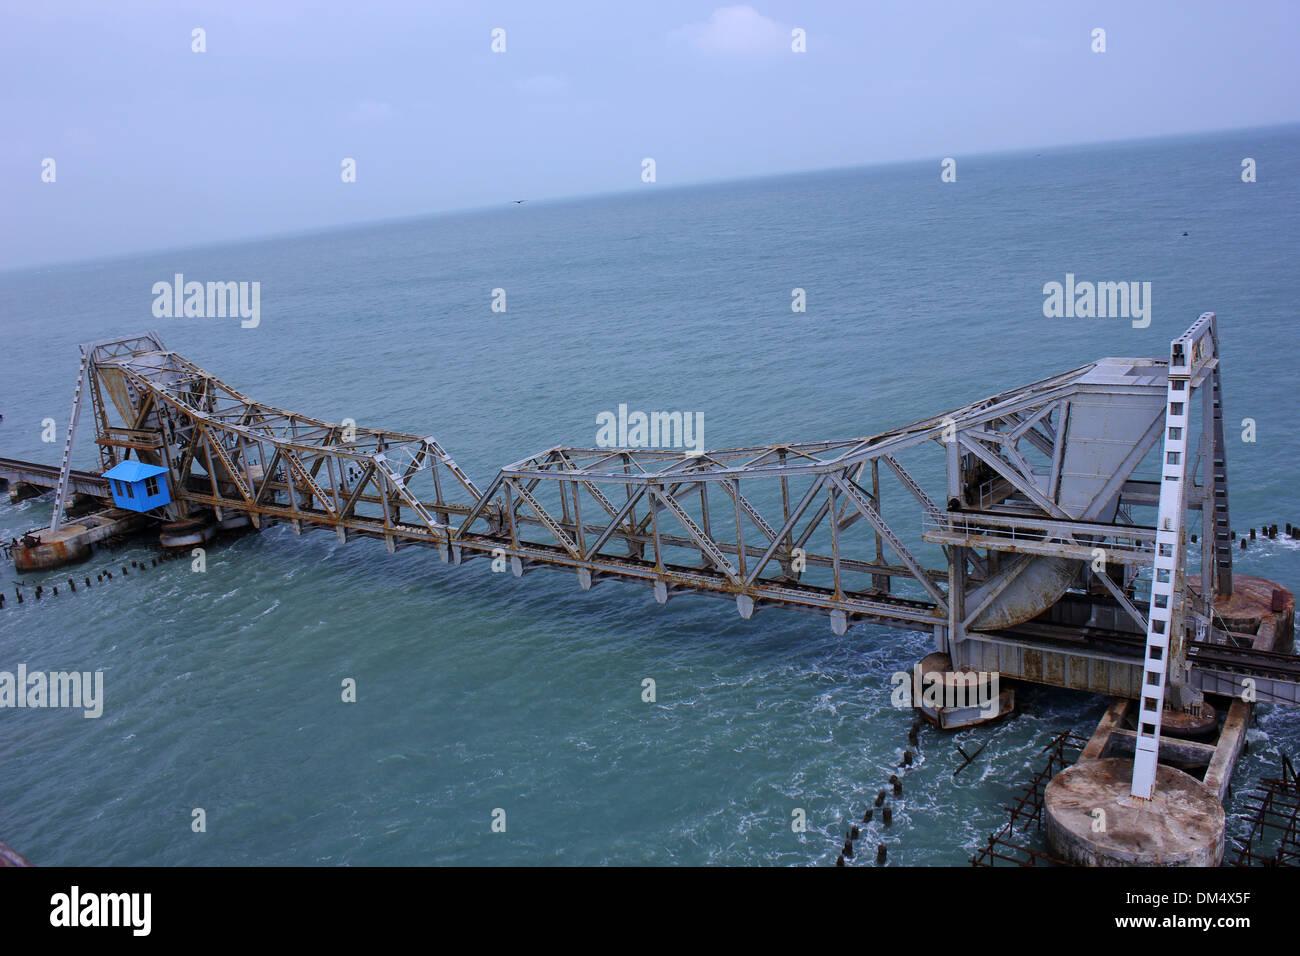 Pamban cantilever Bridge  on the Palk Strait - Stock Image